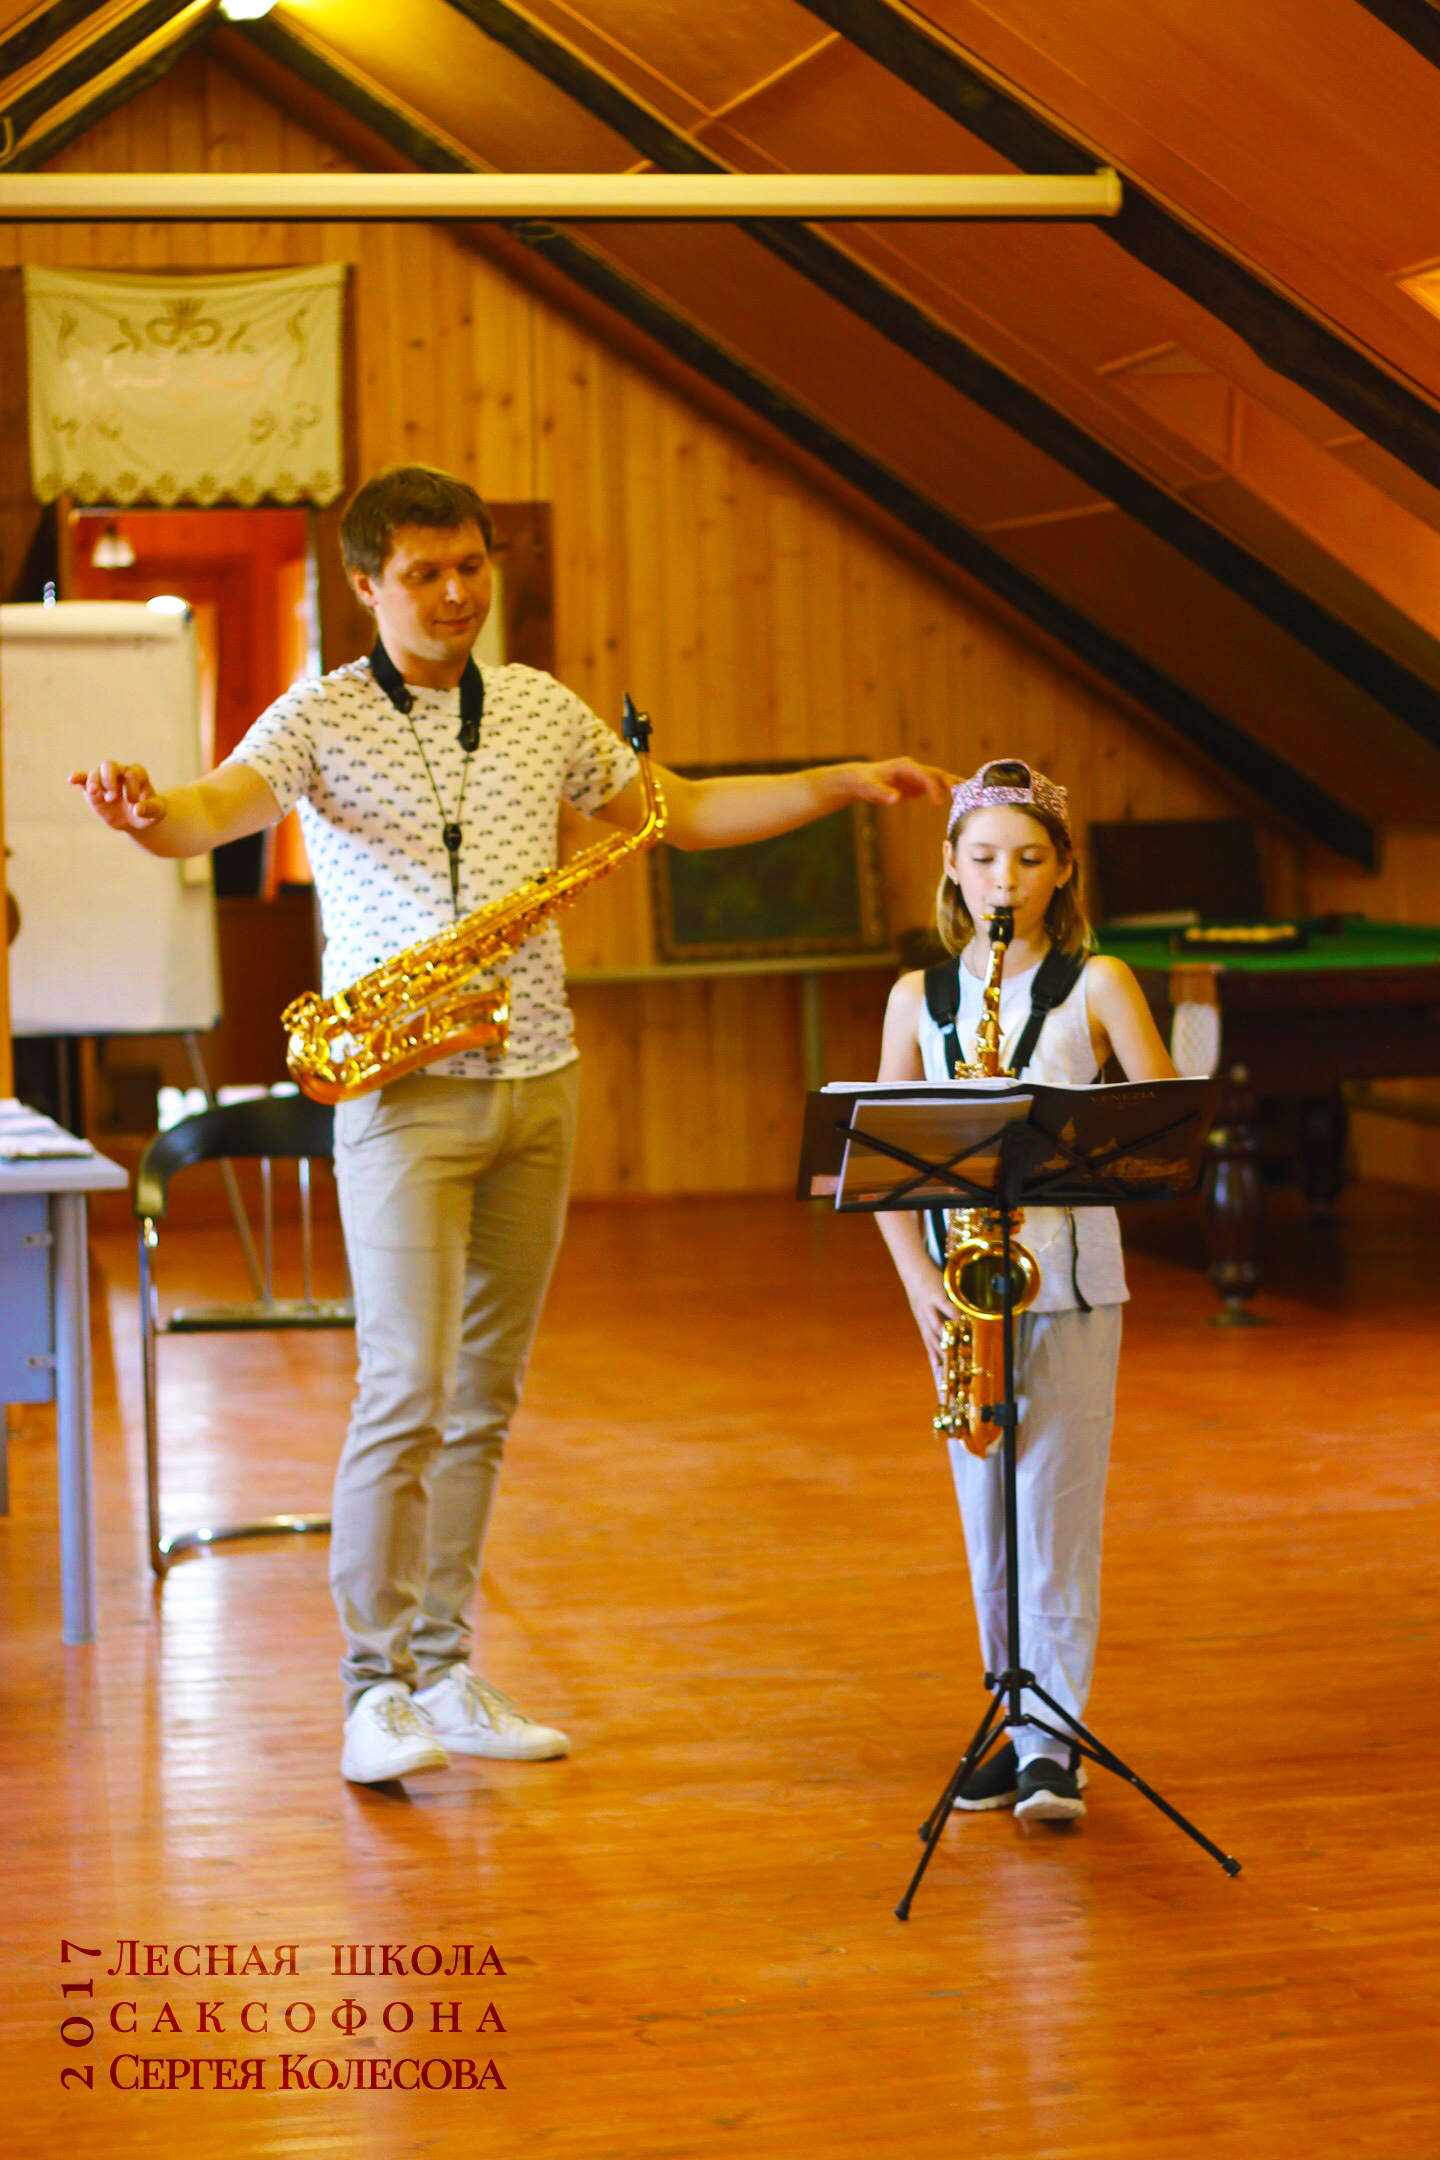 Лесная школа саксофона